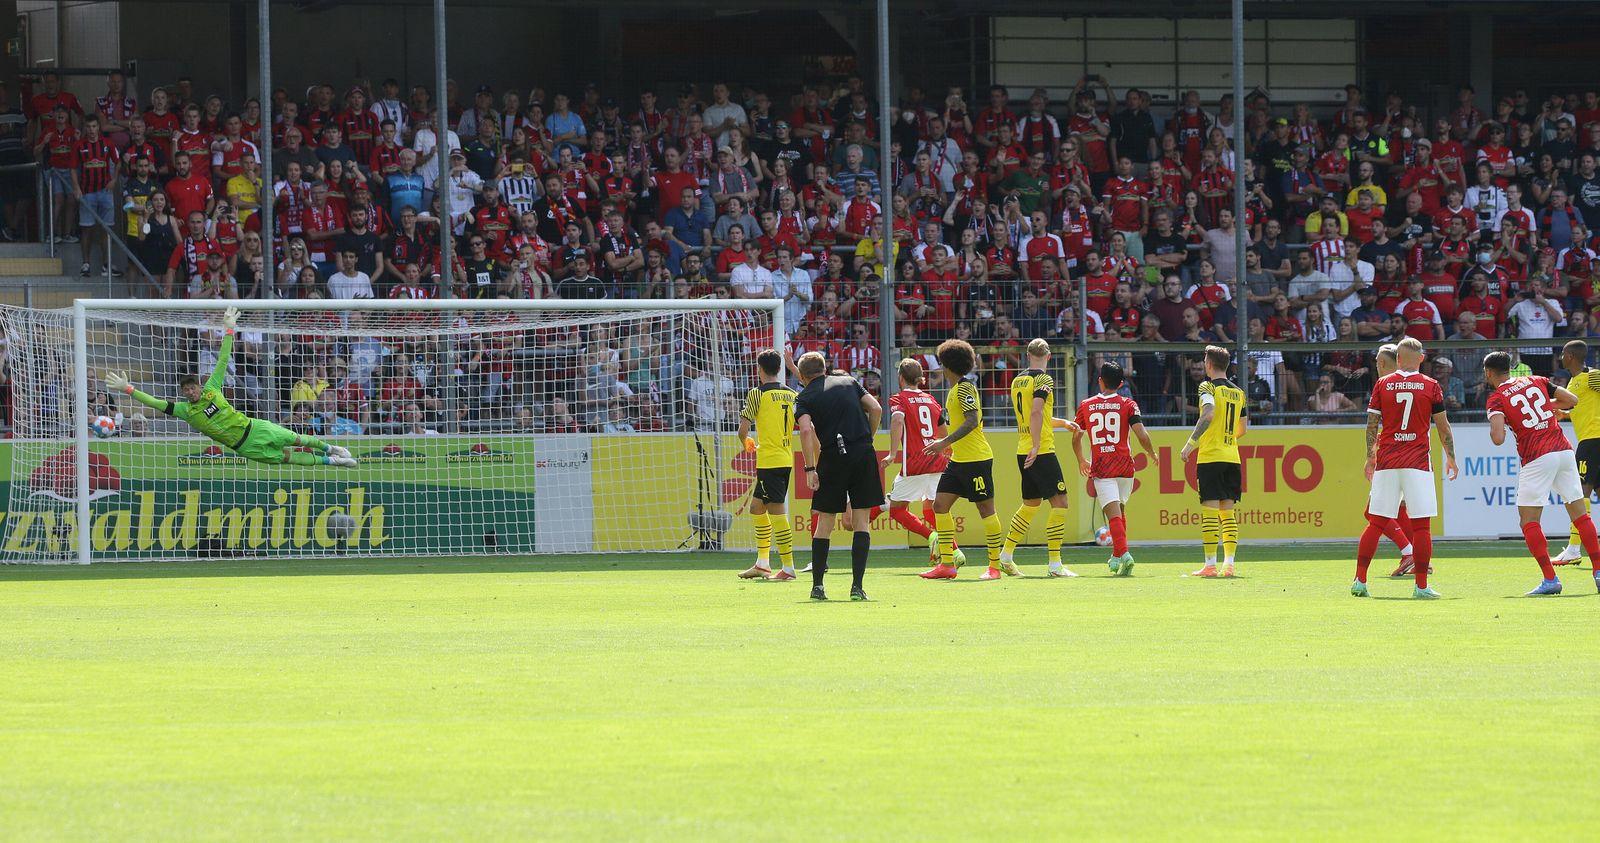 Leipzig , Fußball Bundesliga SC Freiburg - BVB Borussia Dortmund , Tor zum 1 : 0 , rechts: Torschütze Vincenzo Grifo (